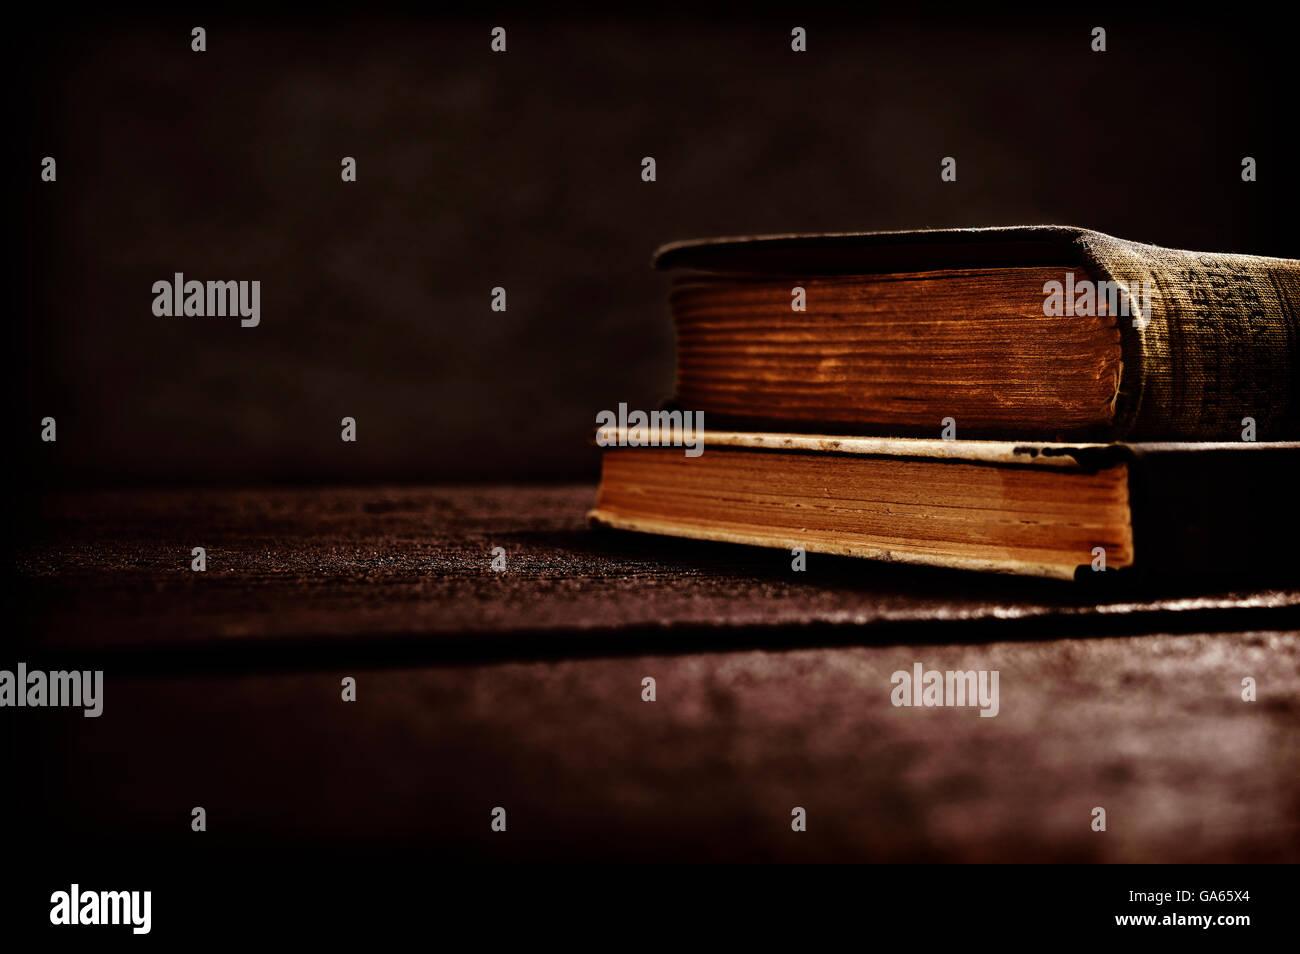 spooky books - Stock Image